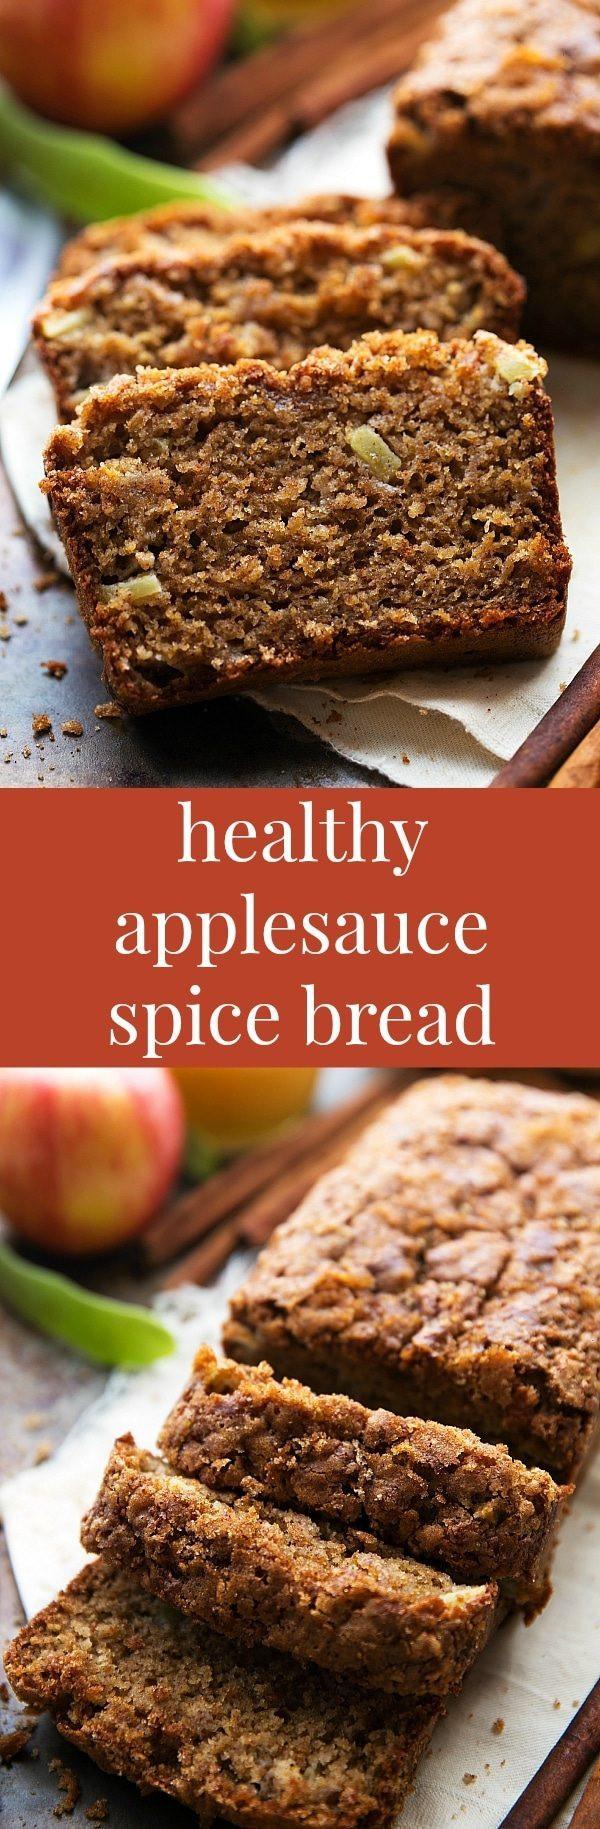 Applesauce Bread Healthy  healthy applesauce bread recipe